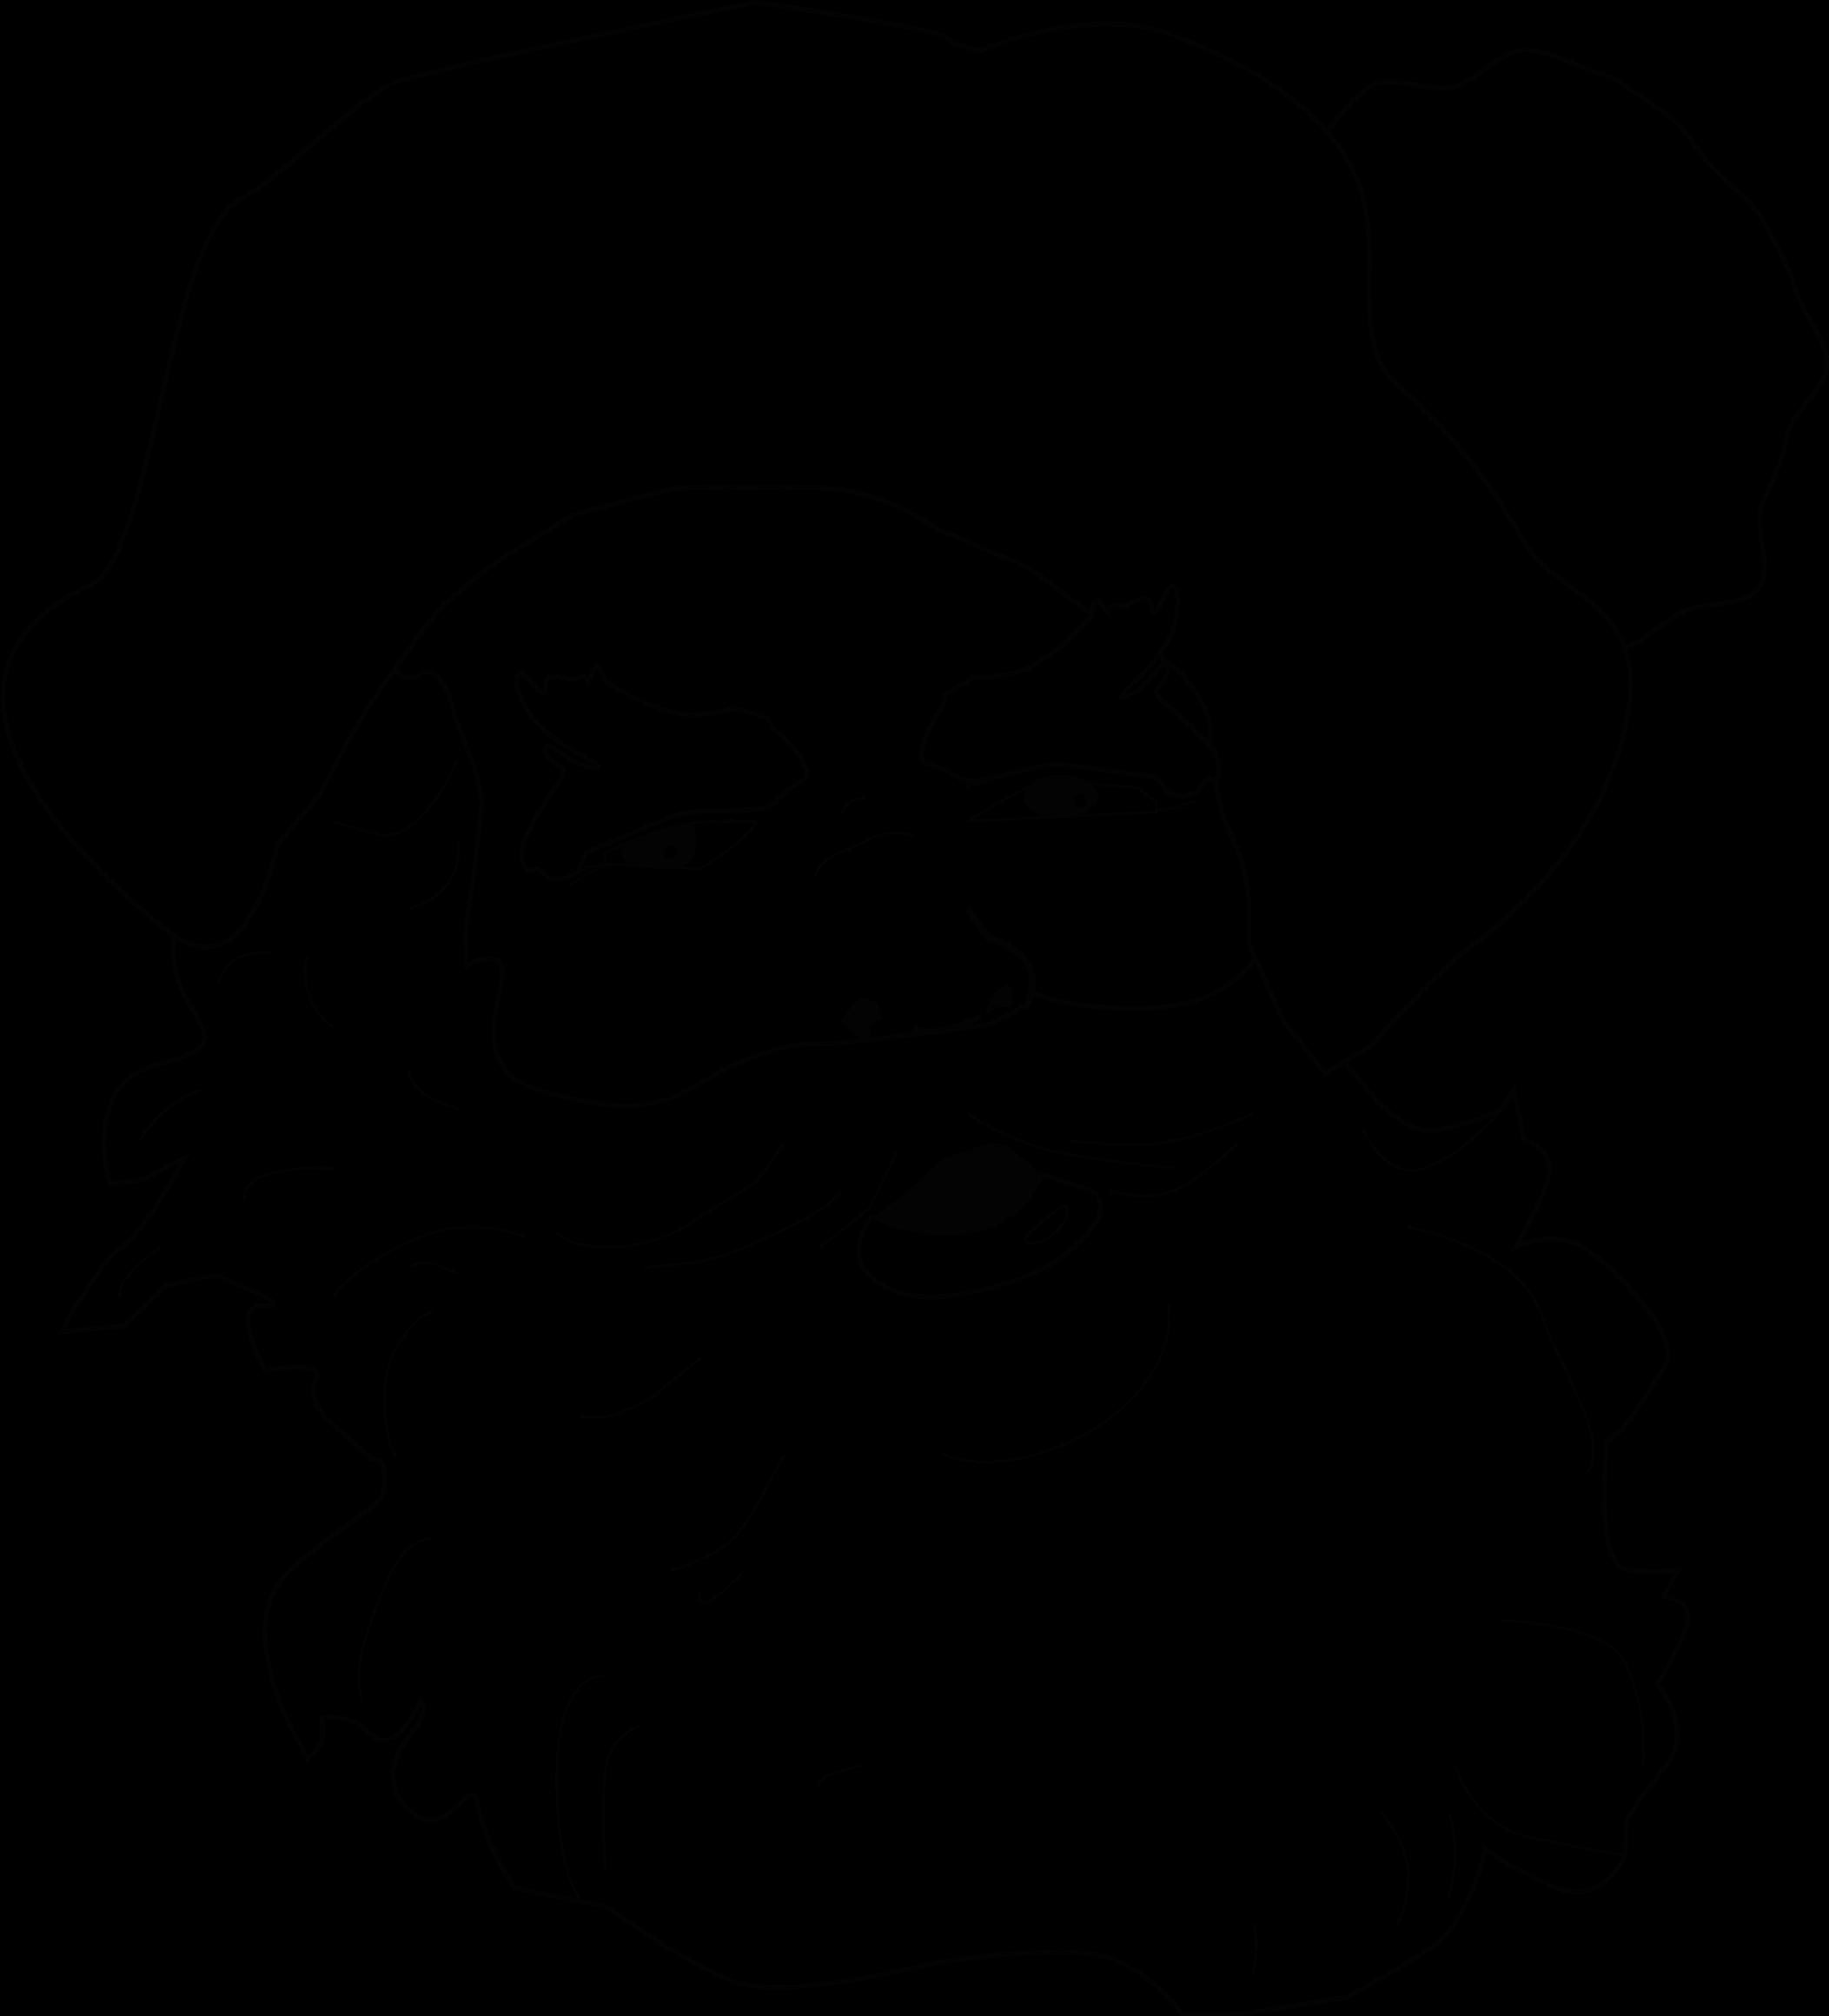 Line Drawing Santa Face : Clipart santa claus face line art